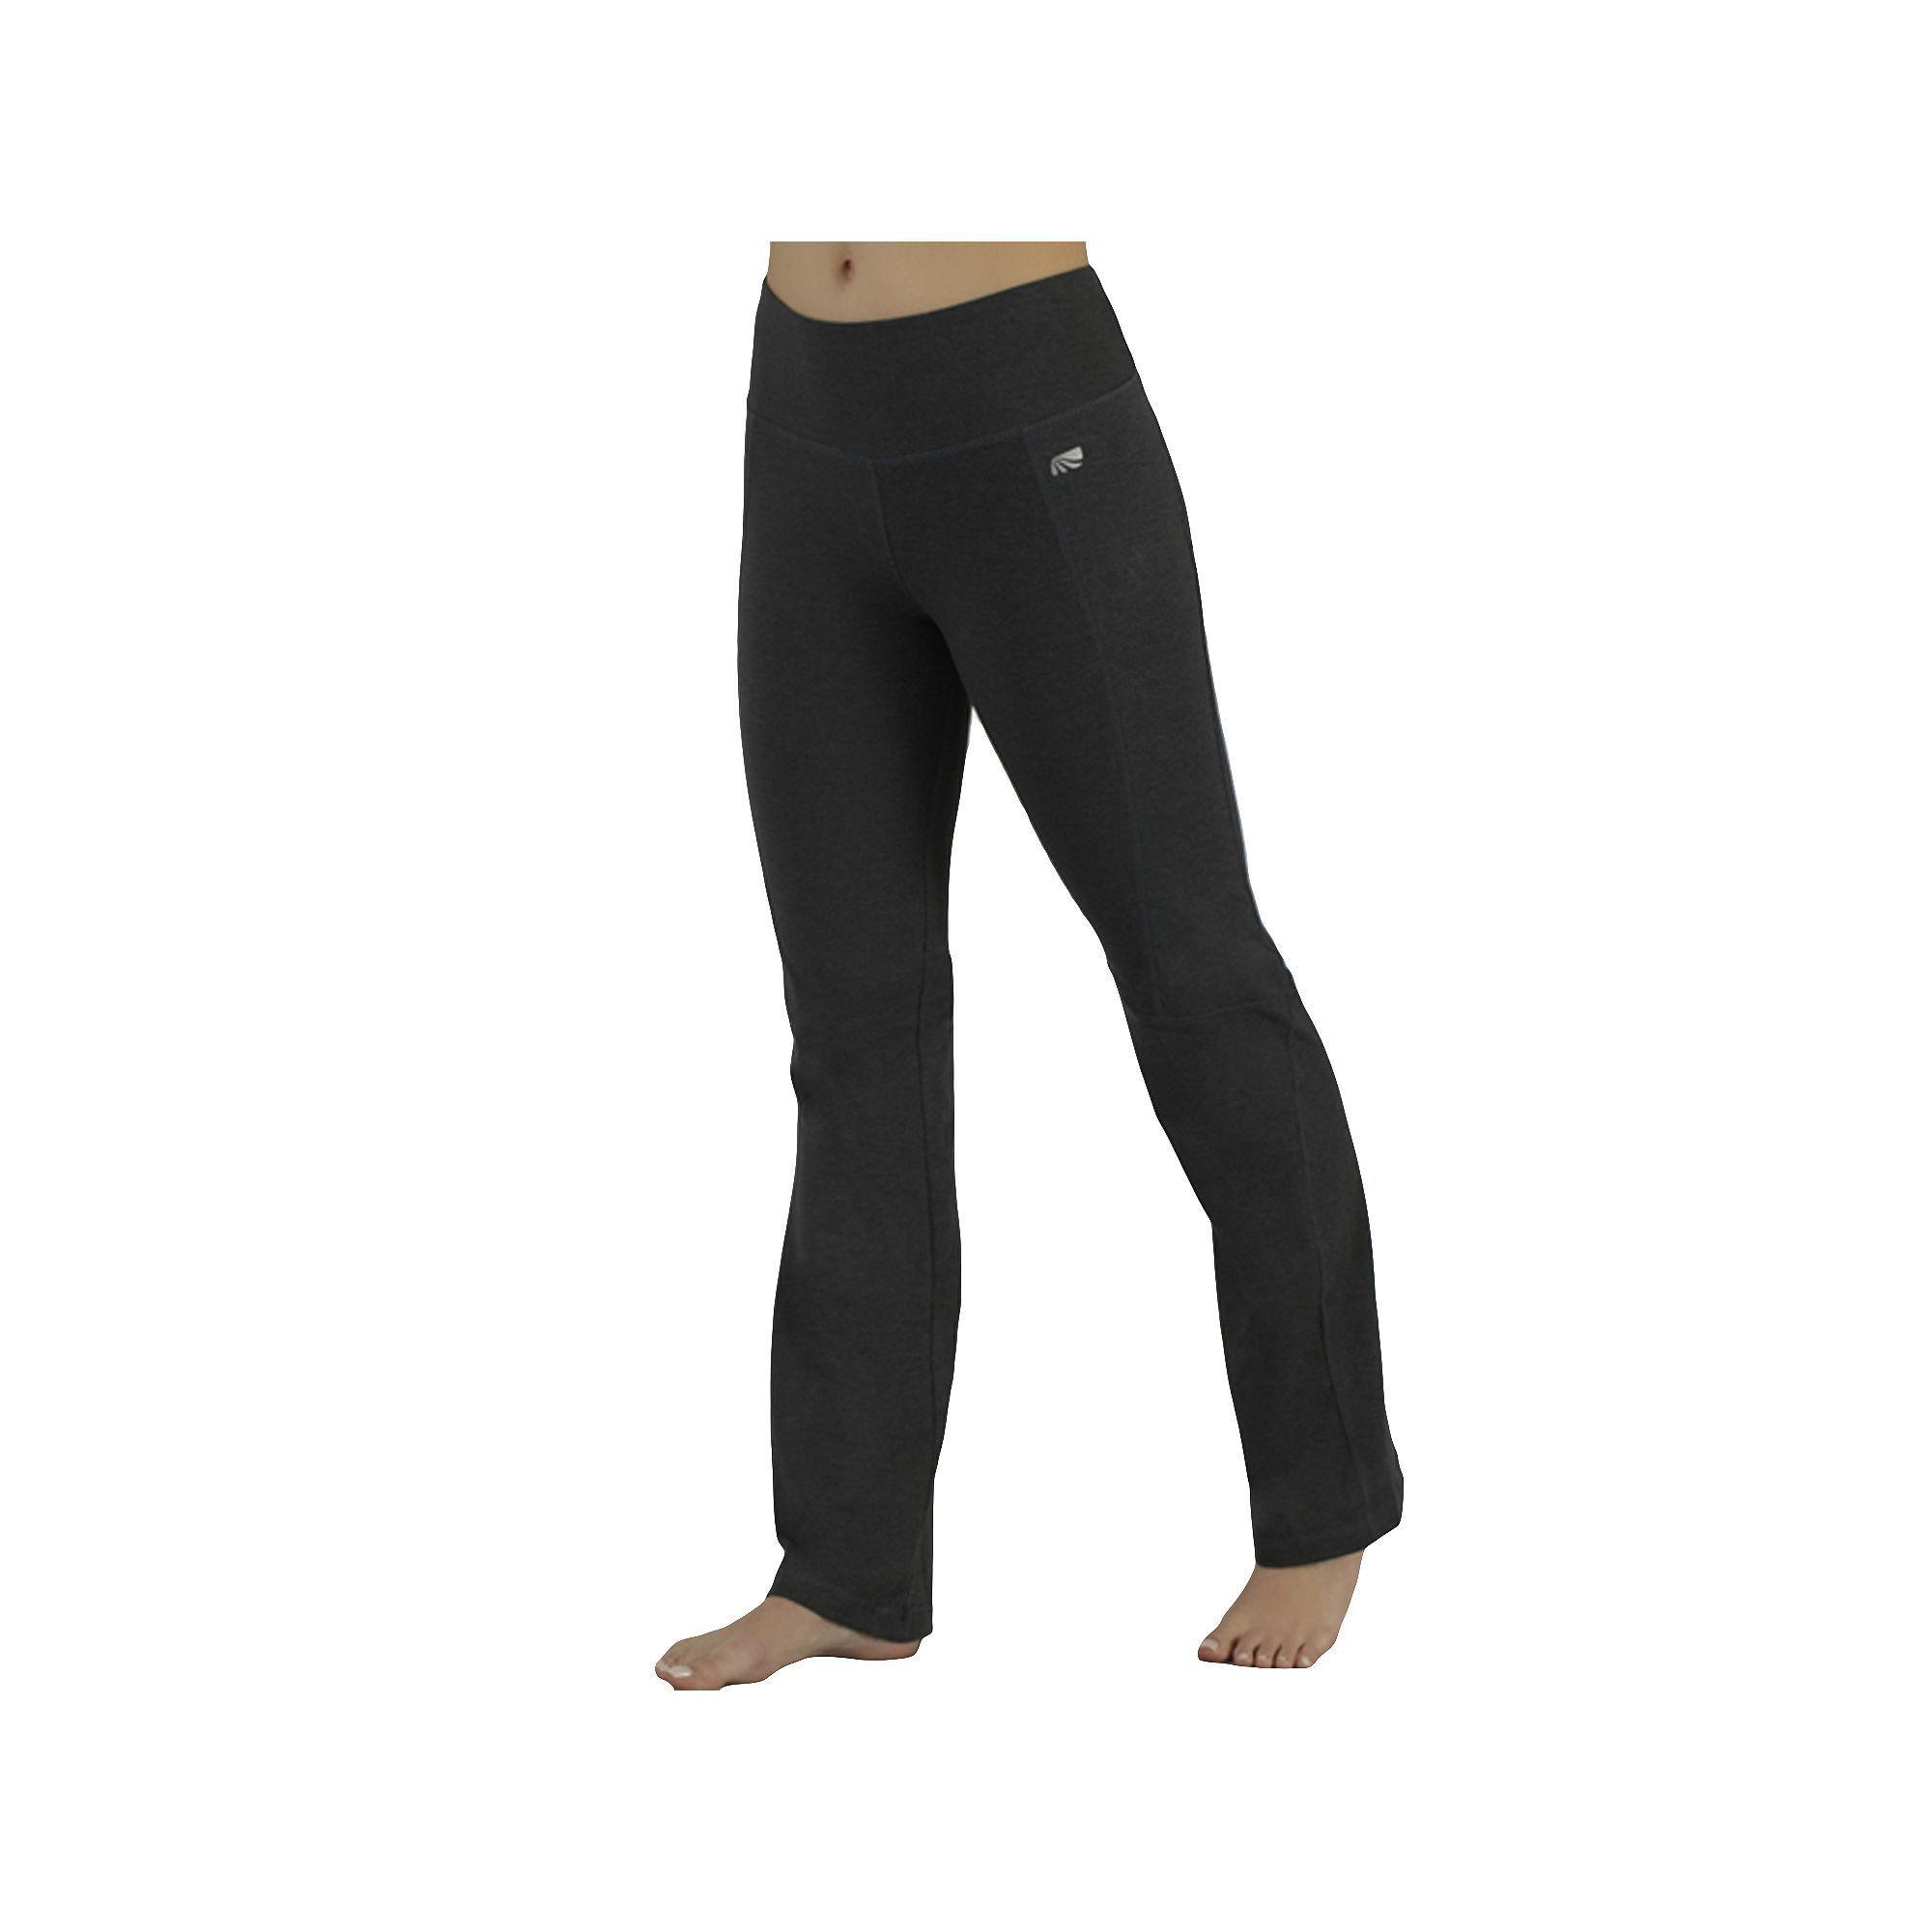 76dd7a1d54a9a Marika Magical Balance Slimming Performance Pants, Women's, Size: Medium,  Grey